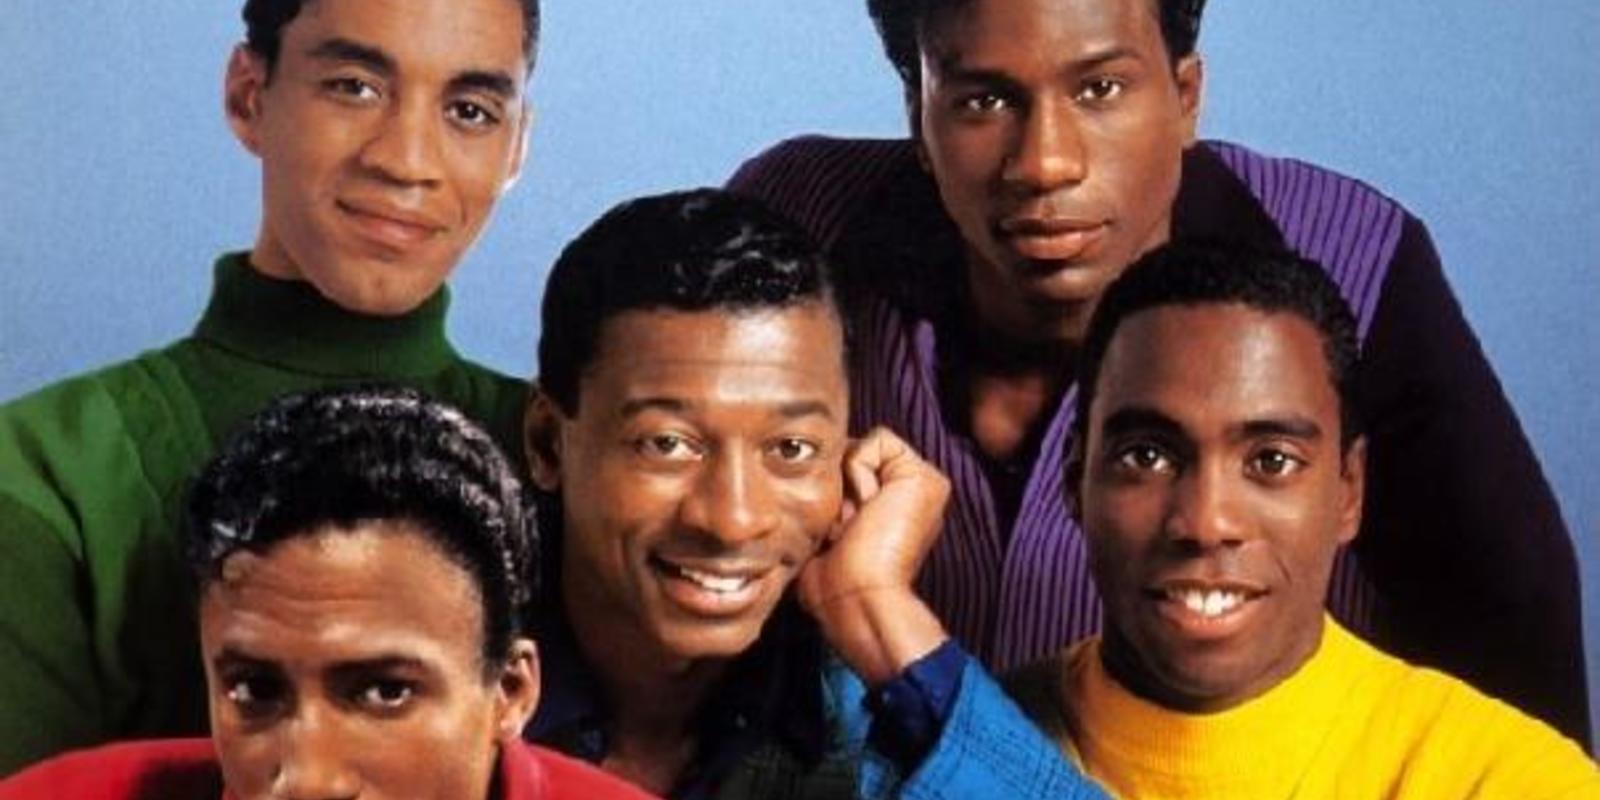 The Five Heartbeats - 30th Anniversary Screening